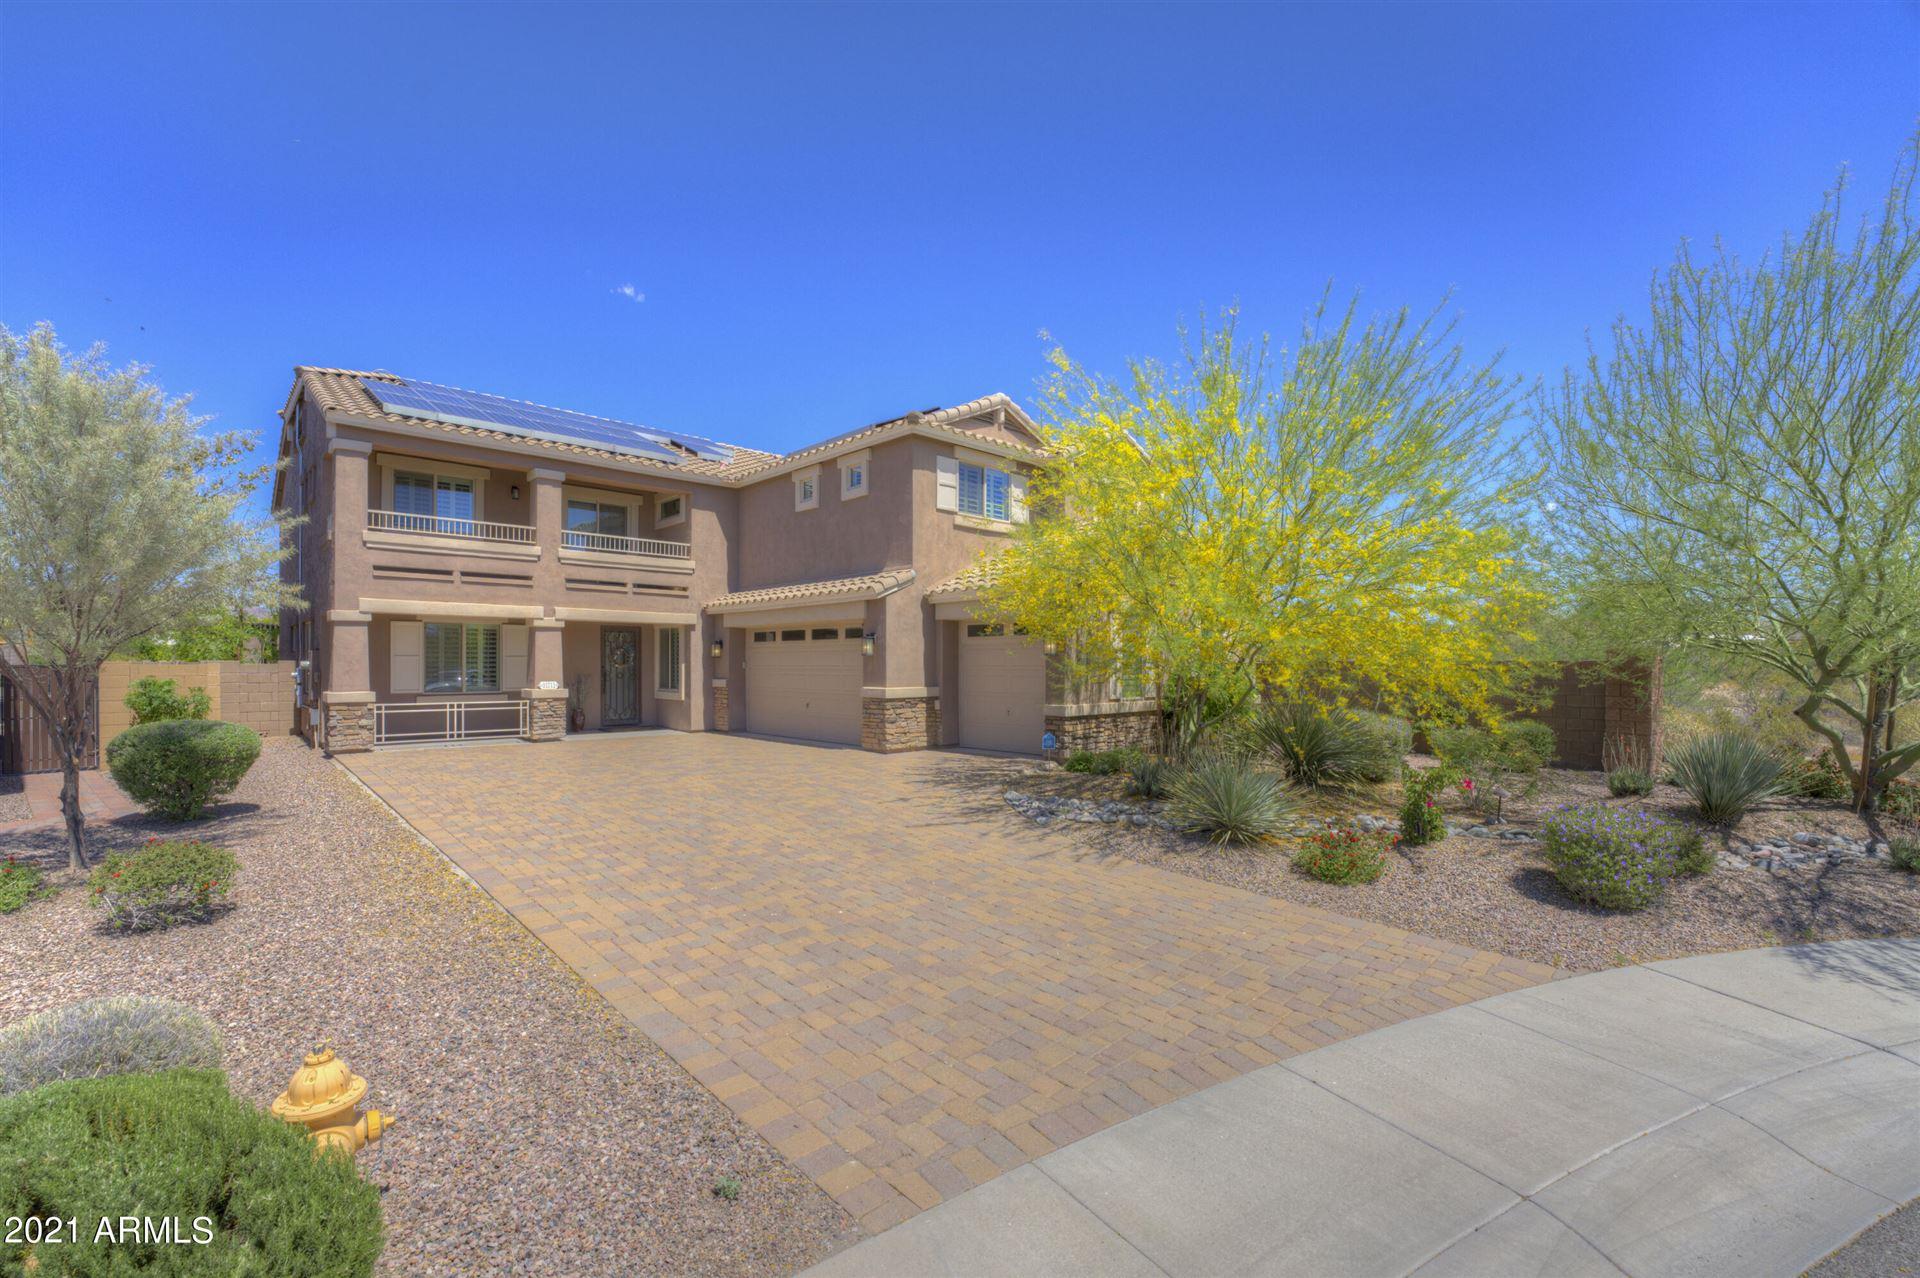 31711 N 47TH Terrace, Cave Creek, AZ 85331 - MLS#: 6230220